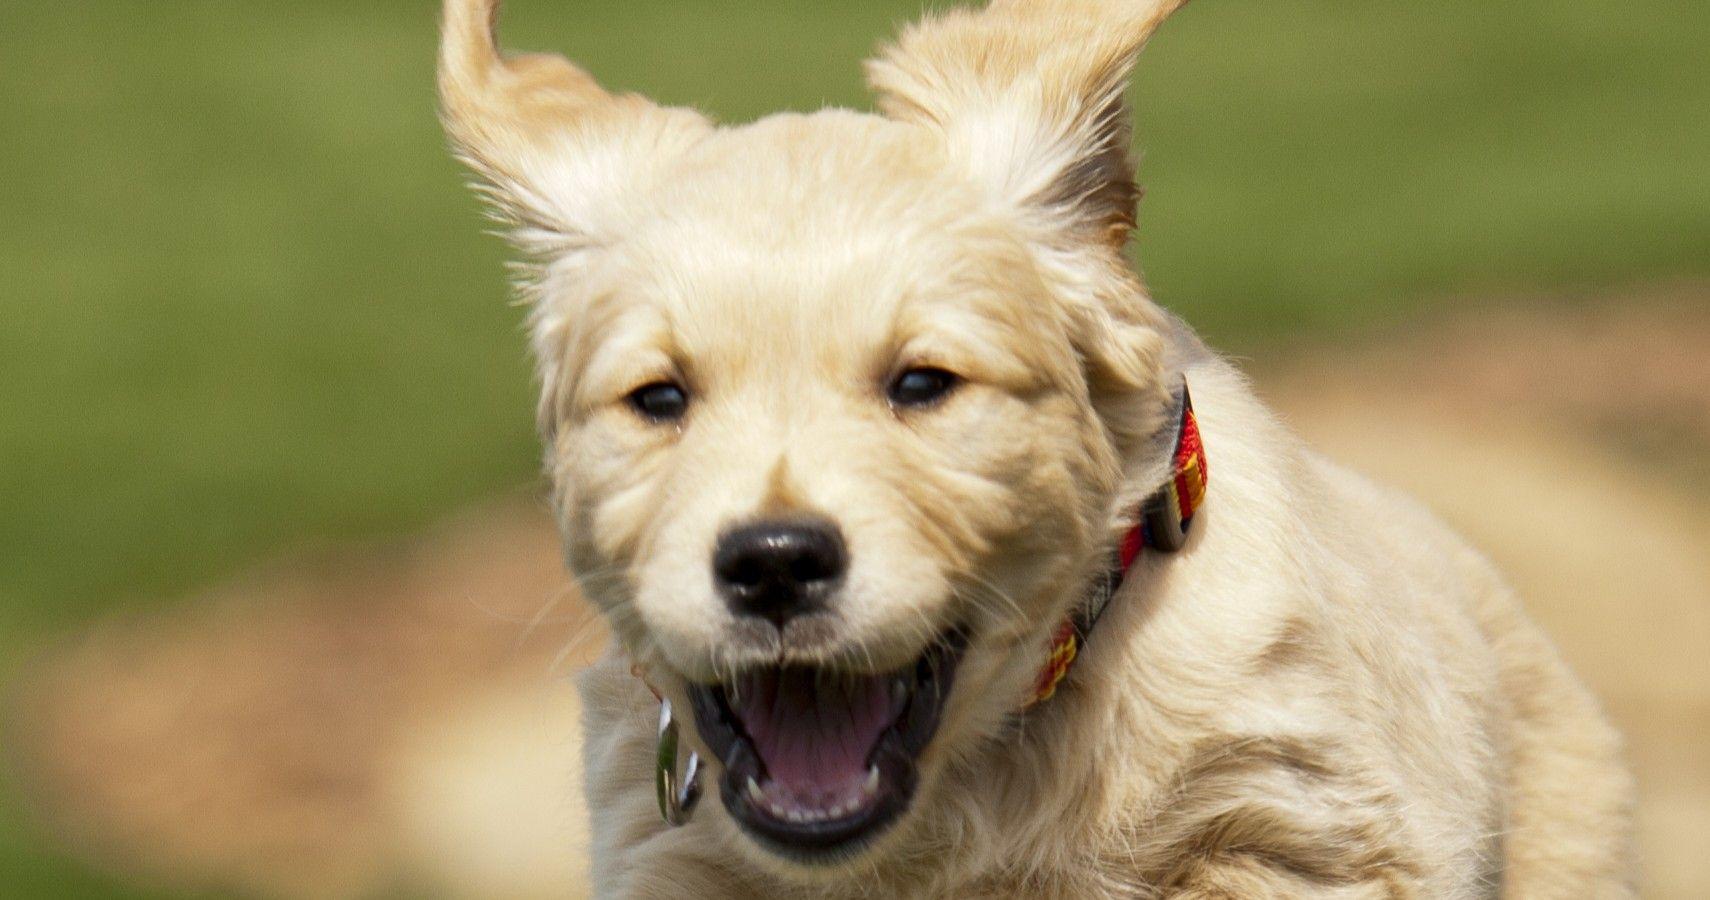 LAZY DOGZ PIPPIN DACHSHUND SASUAGE DOG MULE SLIPPERS LADIES WOMENS MEMORY FOAM